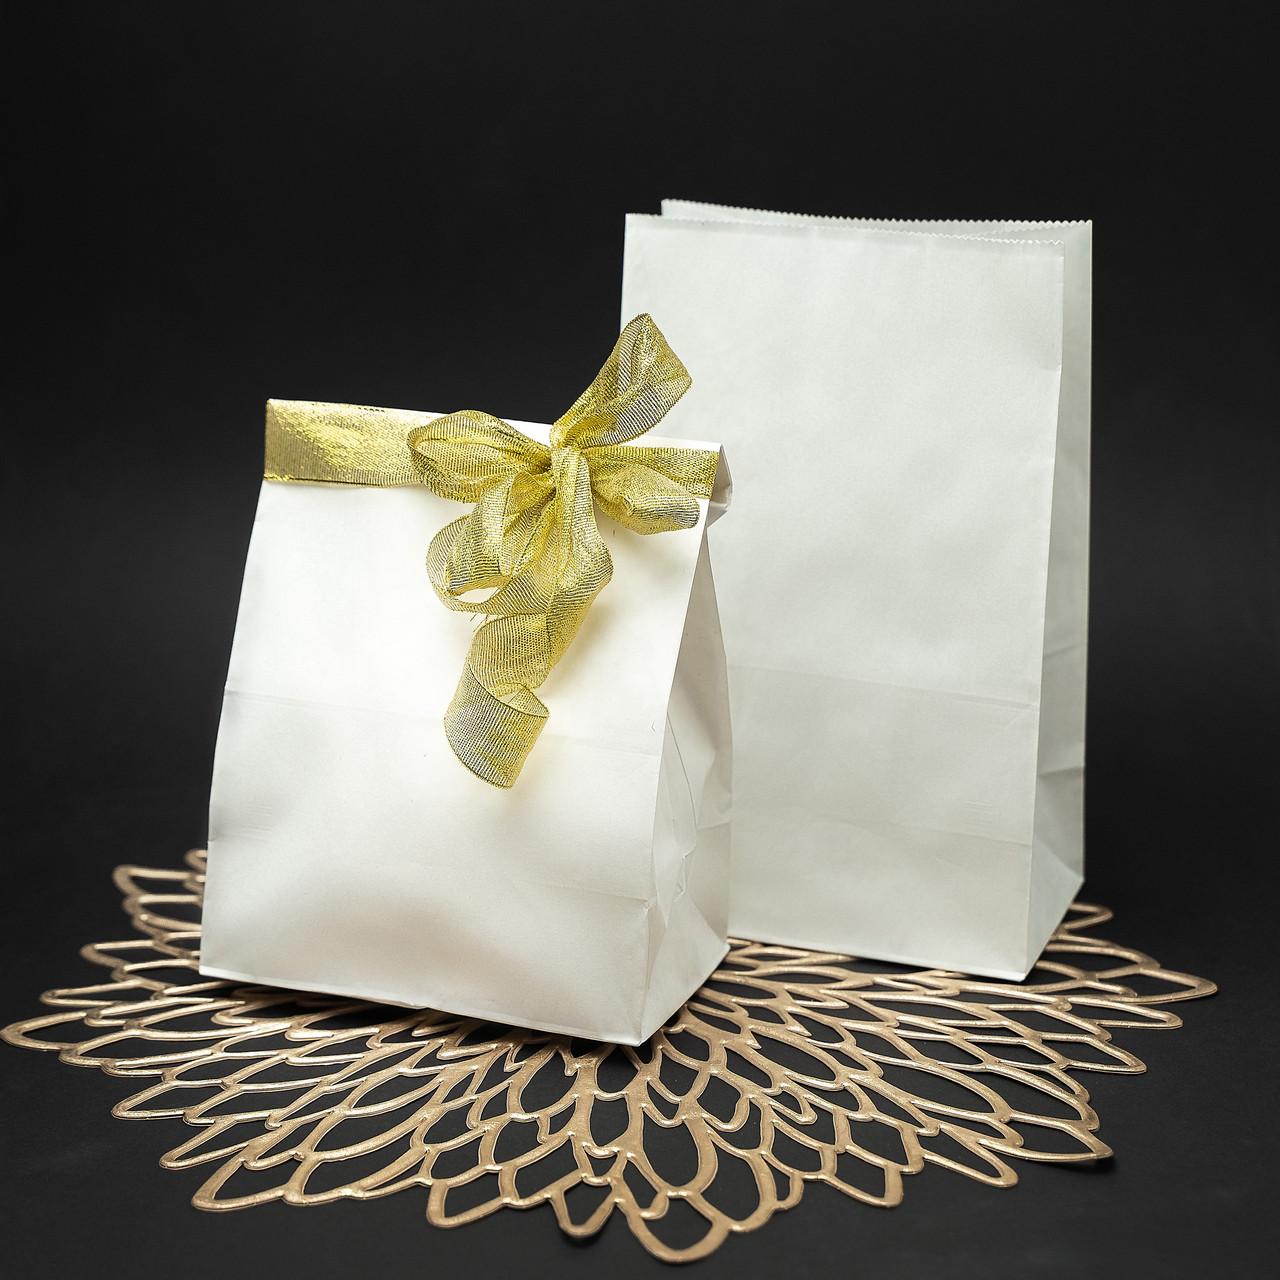 Пакет паперовий білий з плоским дном 260*150*350 мм без ручок